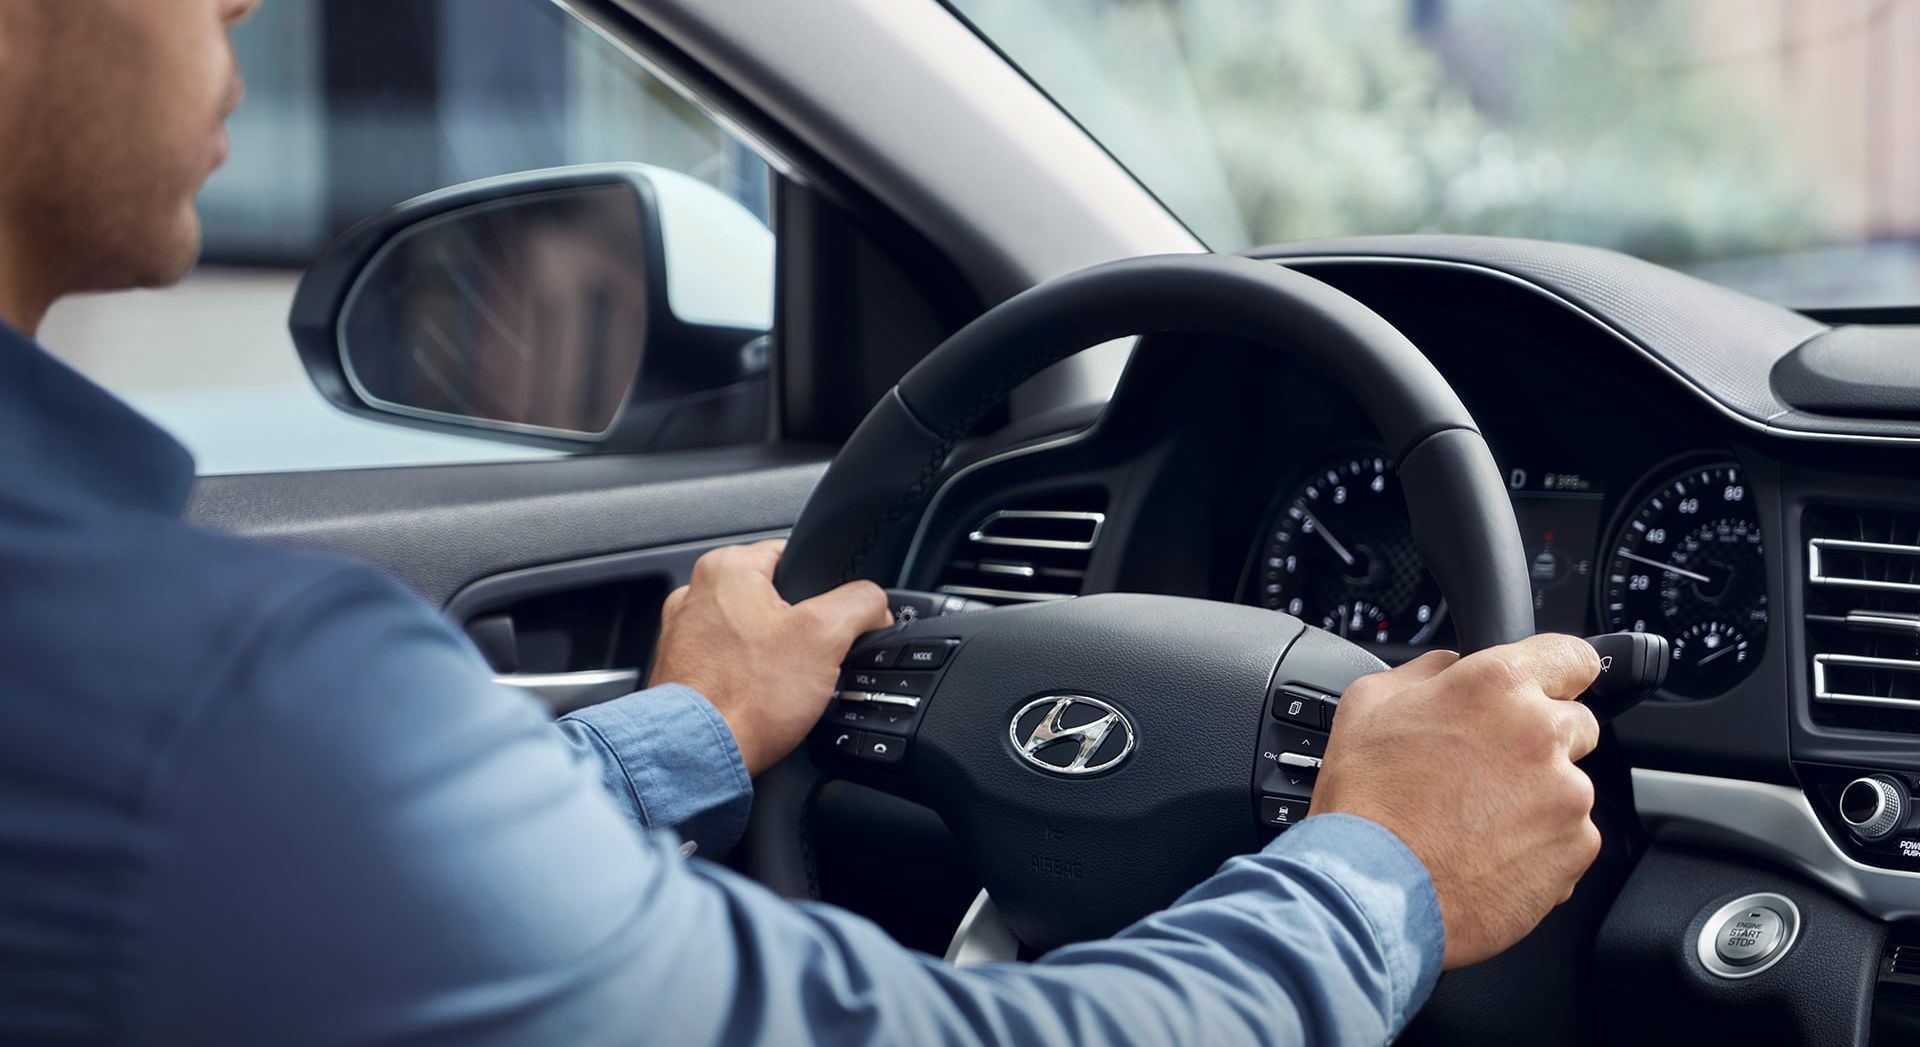 Cockpit of the Hyundai Elantra